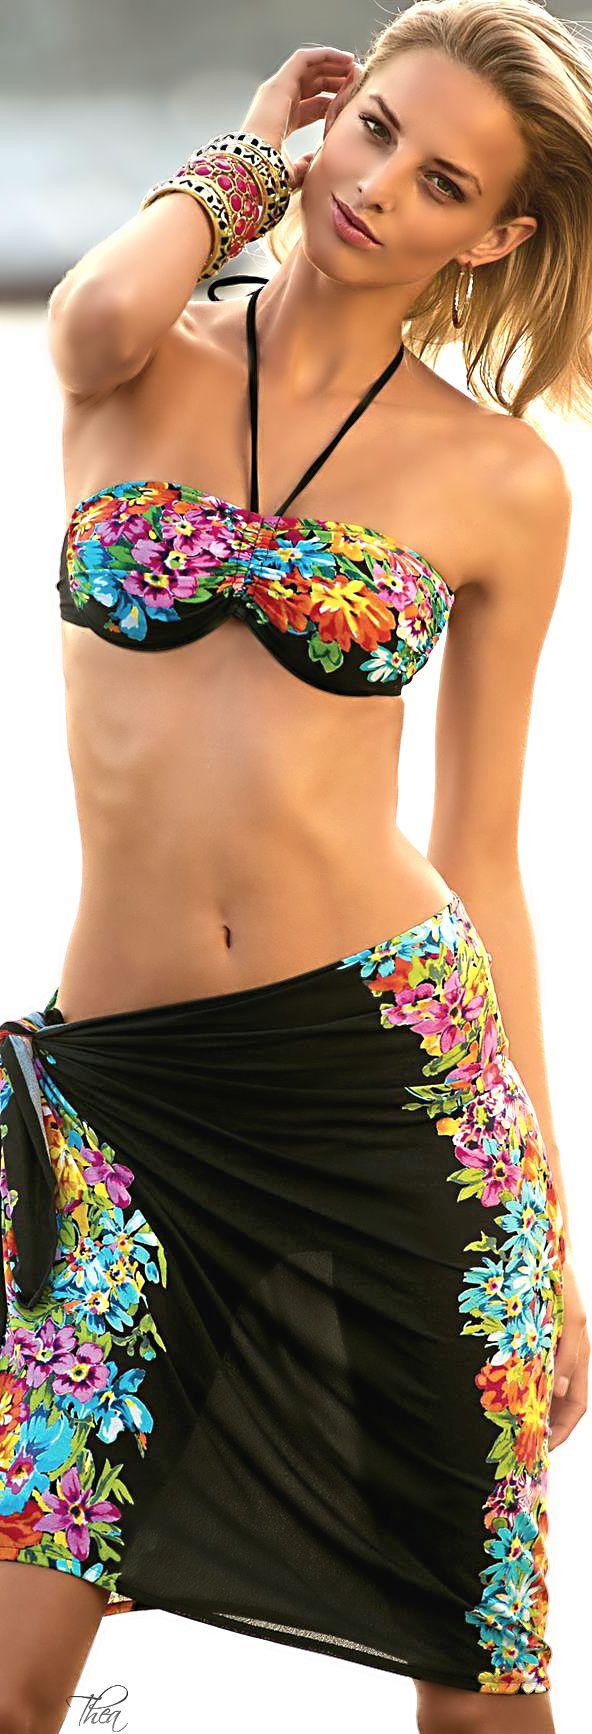 hermans fashion chic glamour swimwear